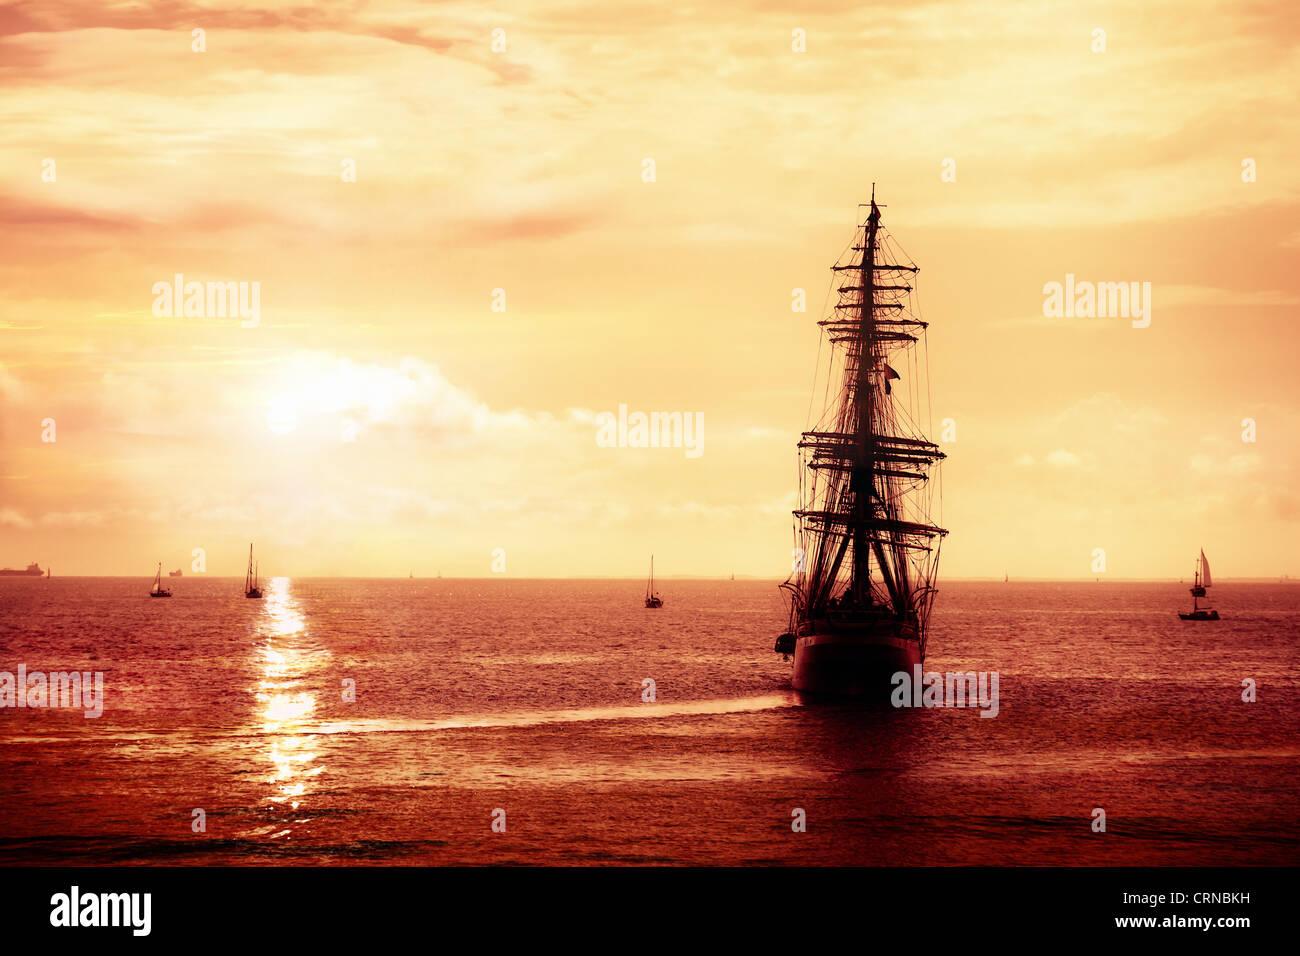 Pirate ship sailing Stock Photo